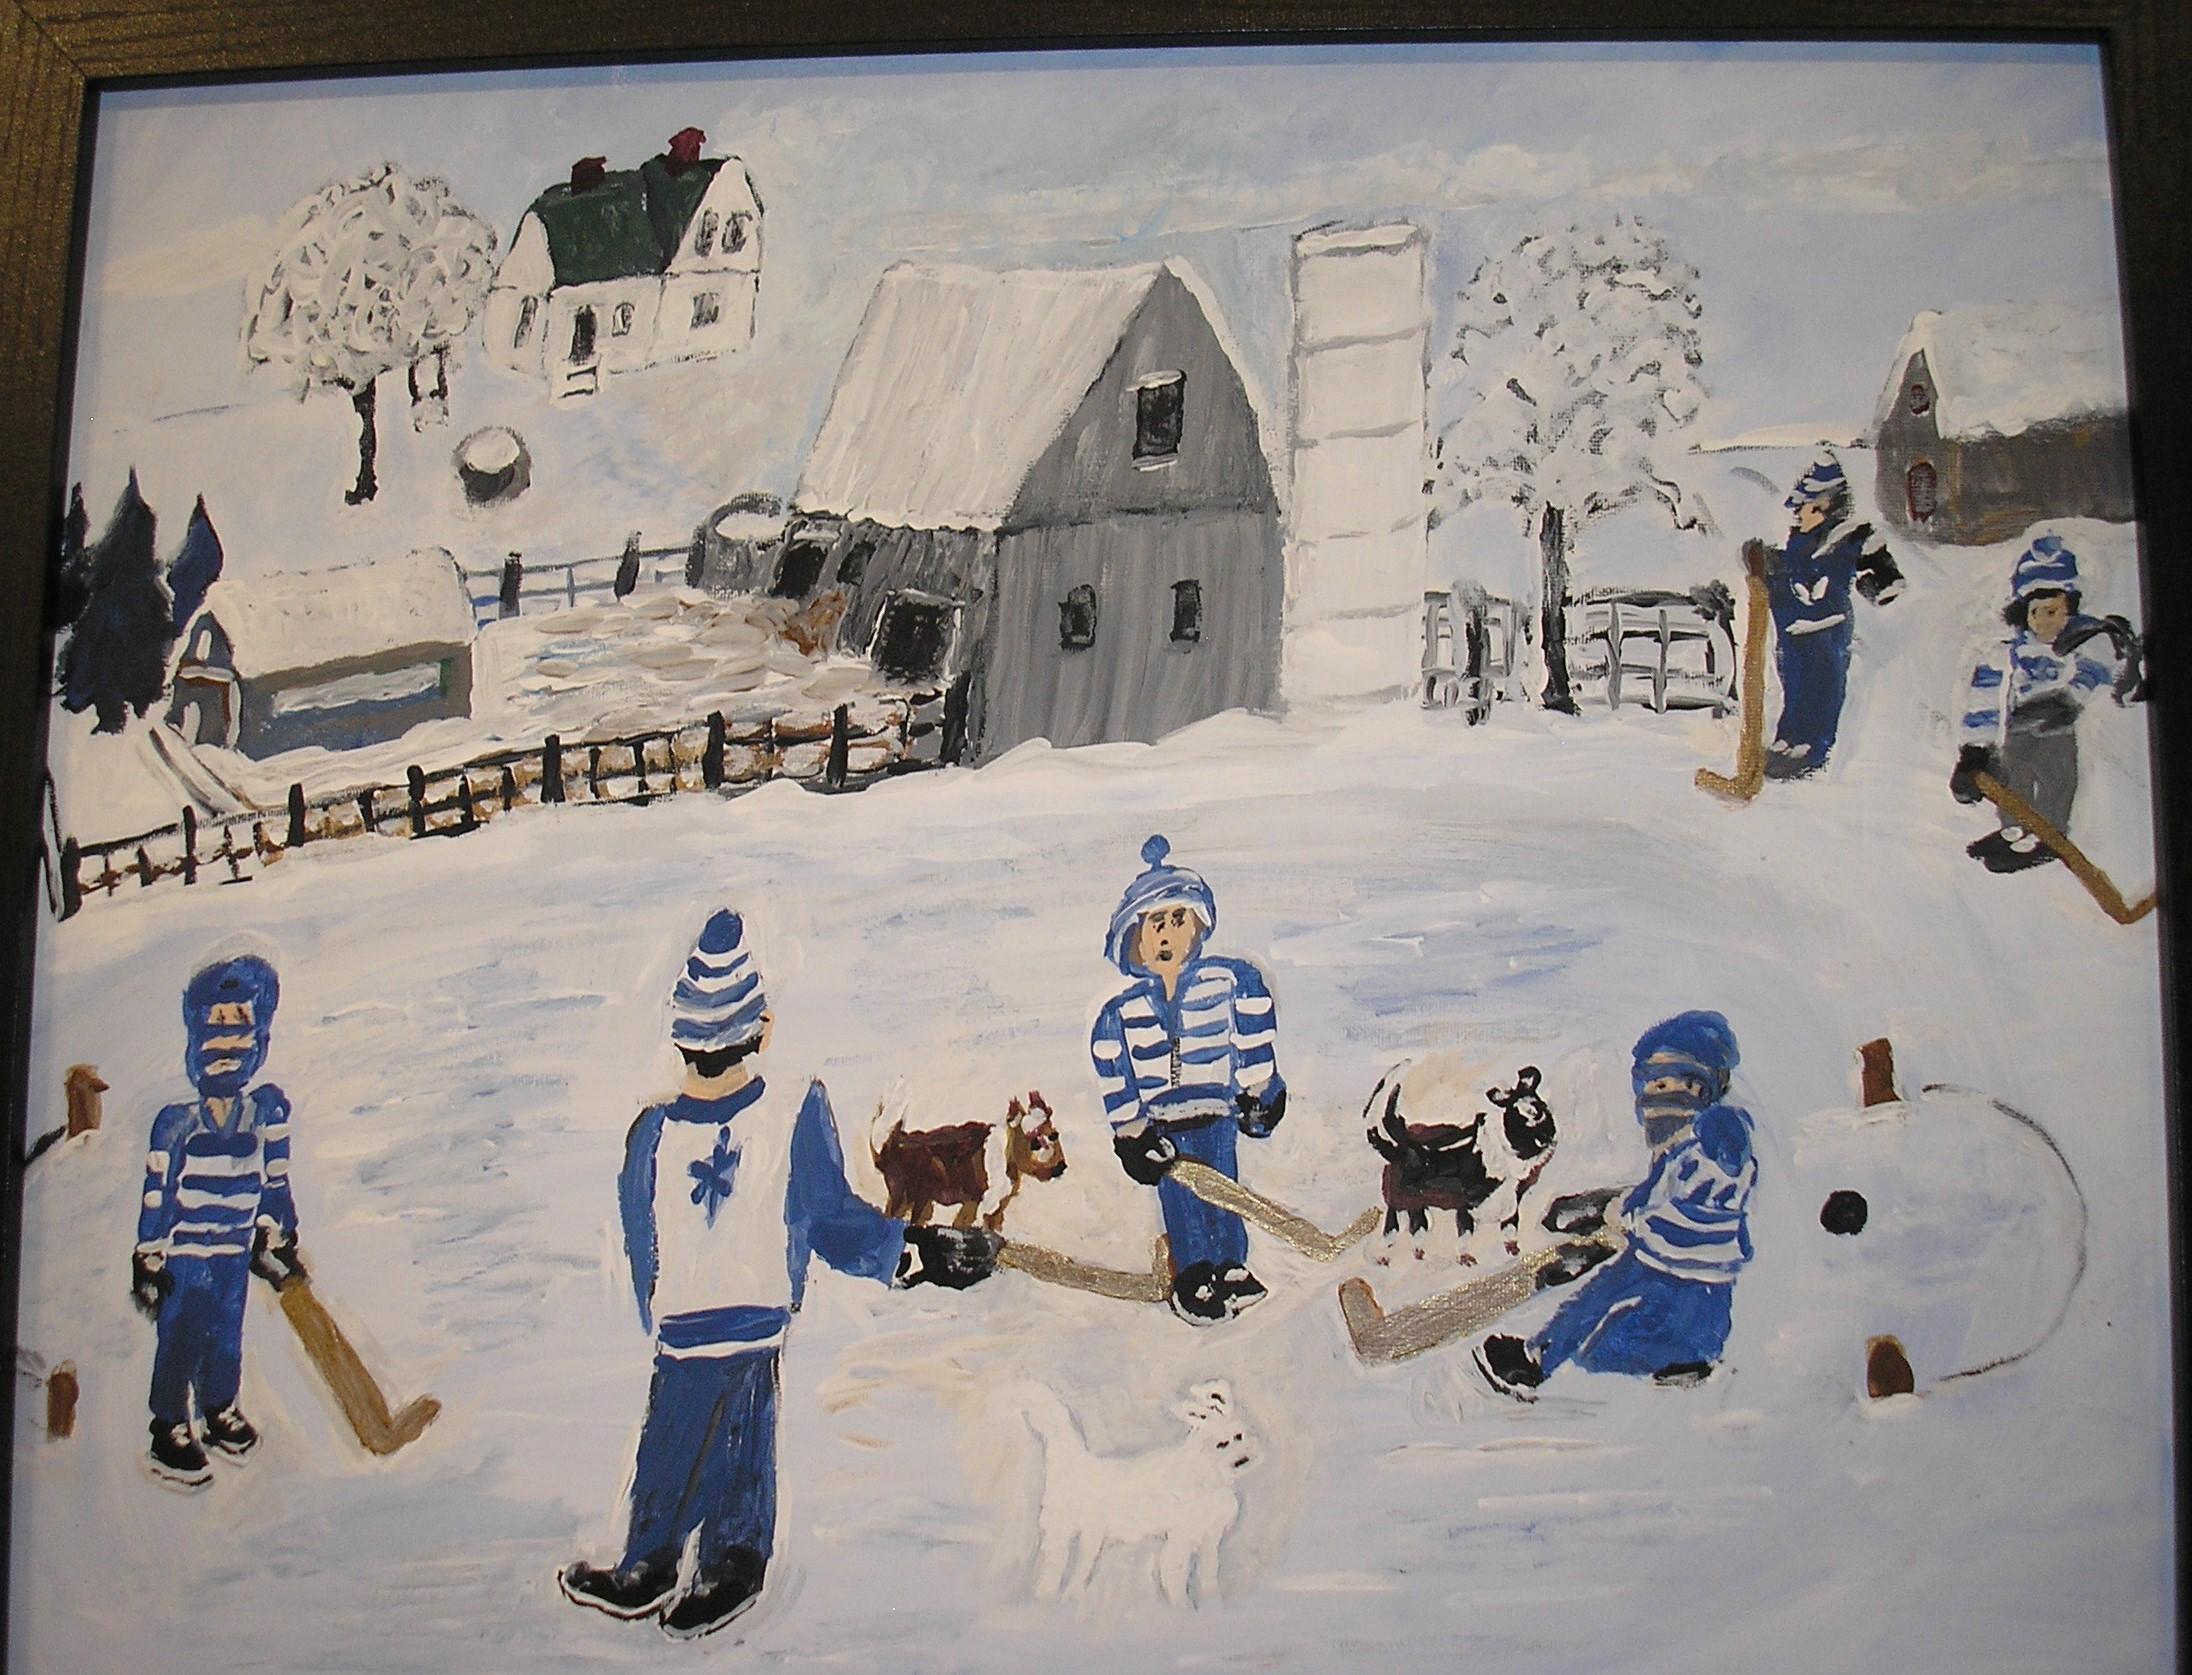 Hockey on the Pond - AMc